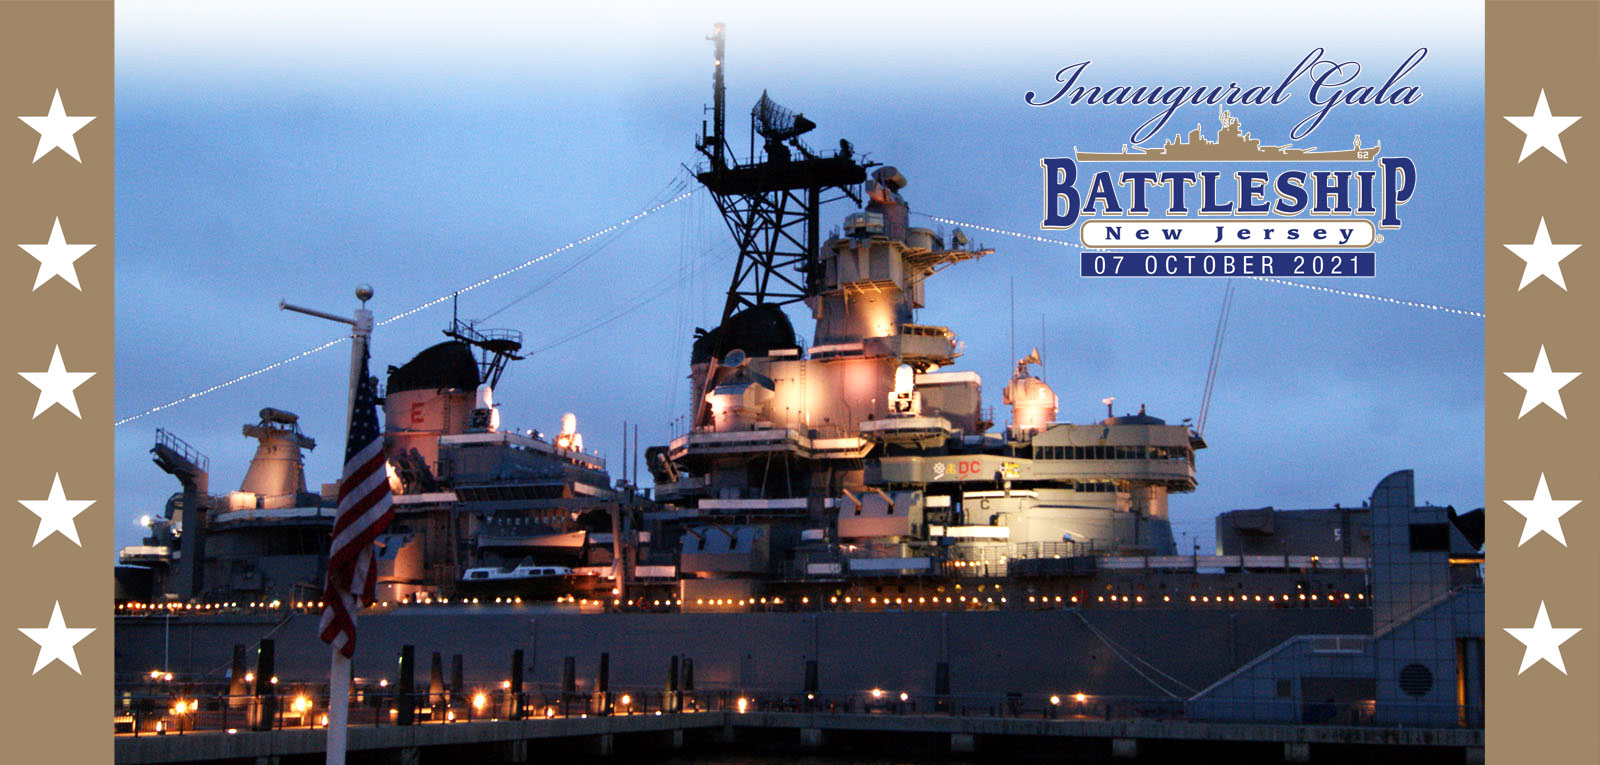 Inaugural Gala on the Battleship NJ October 7 2021